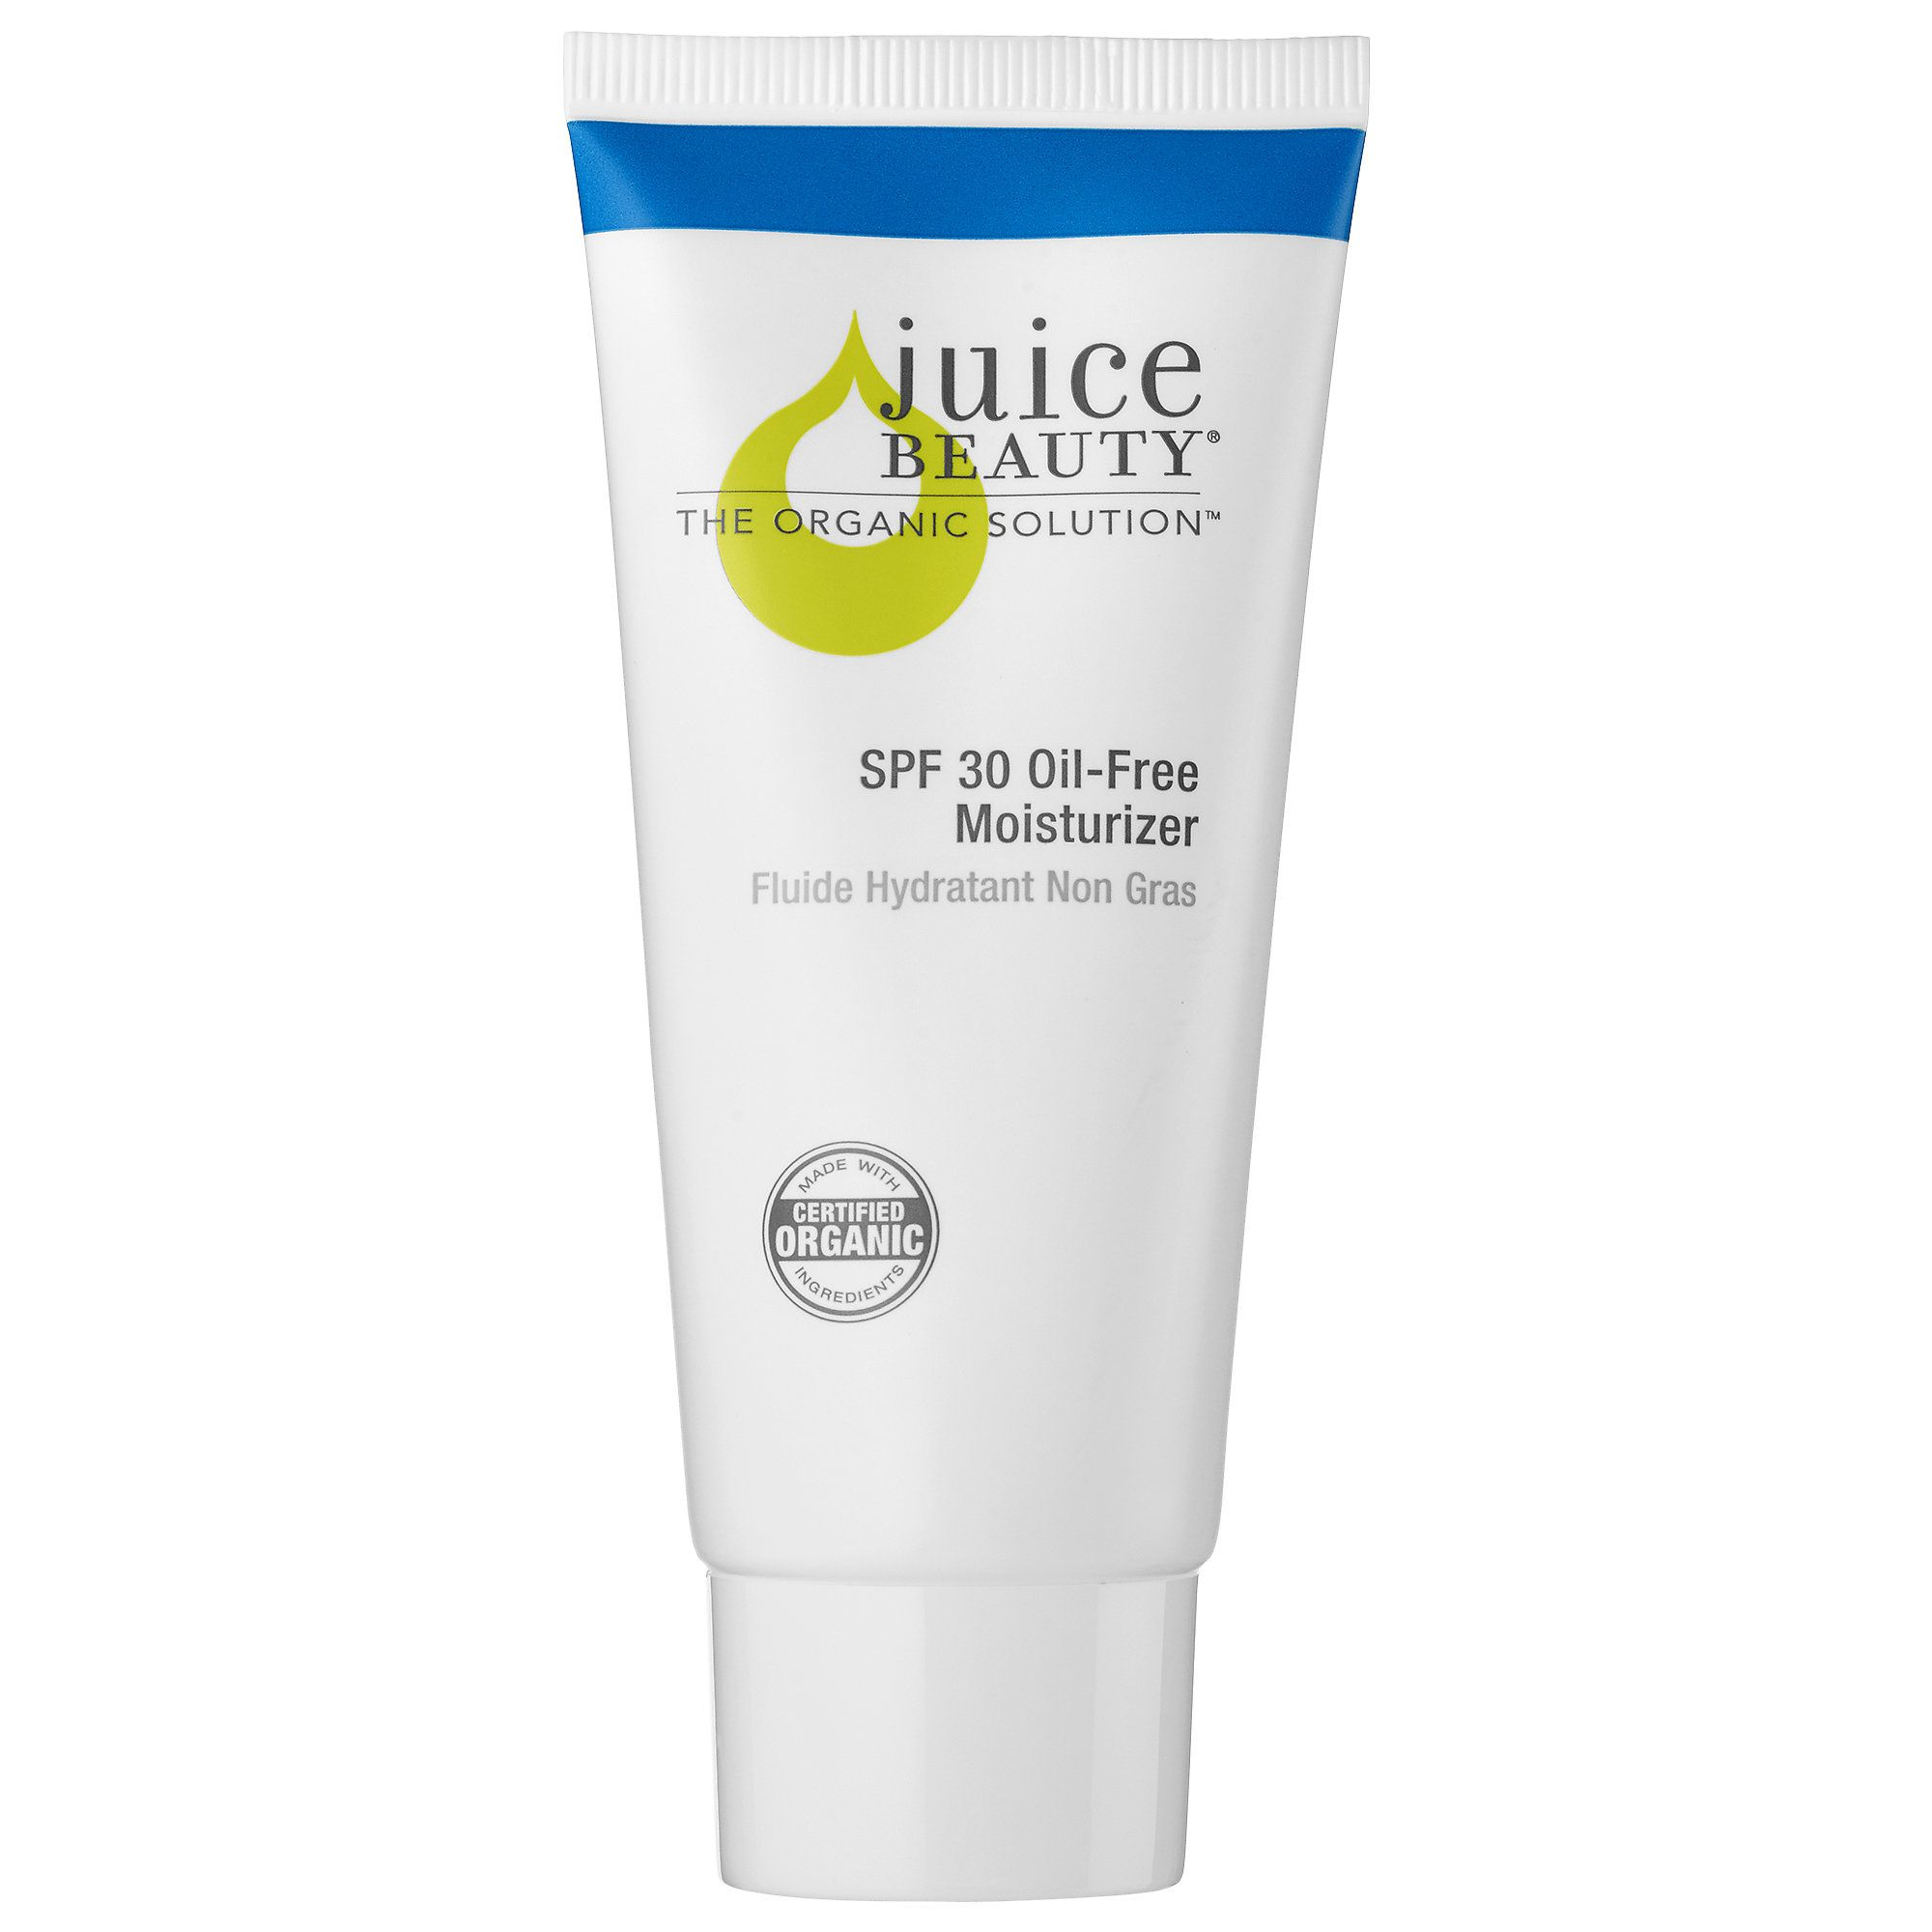 SPF 30 Oil-Free Moisturizer | Oil free moisturizers, Juice ...